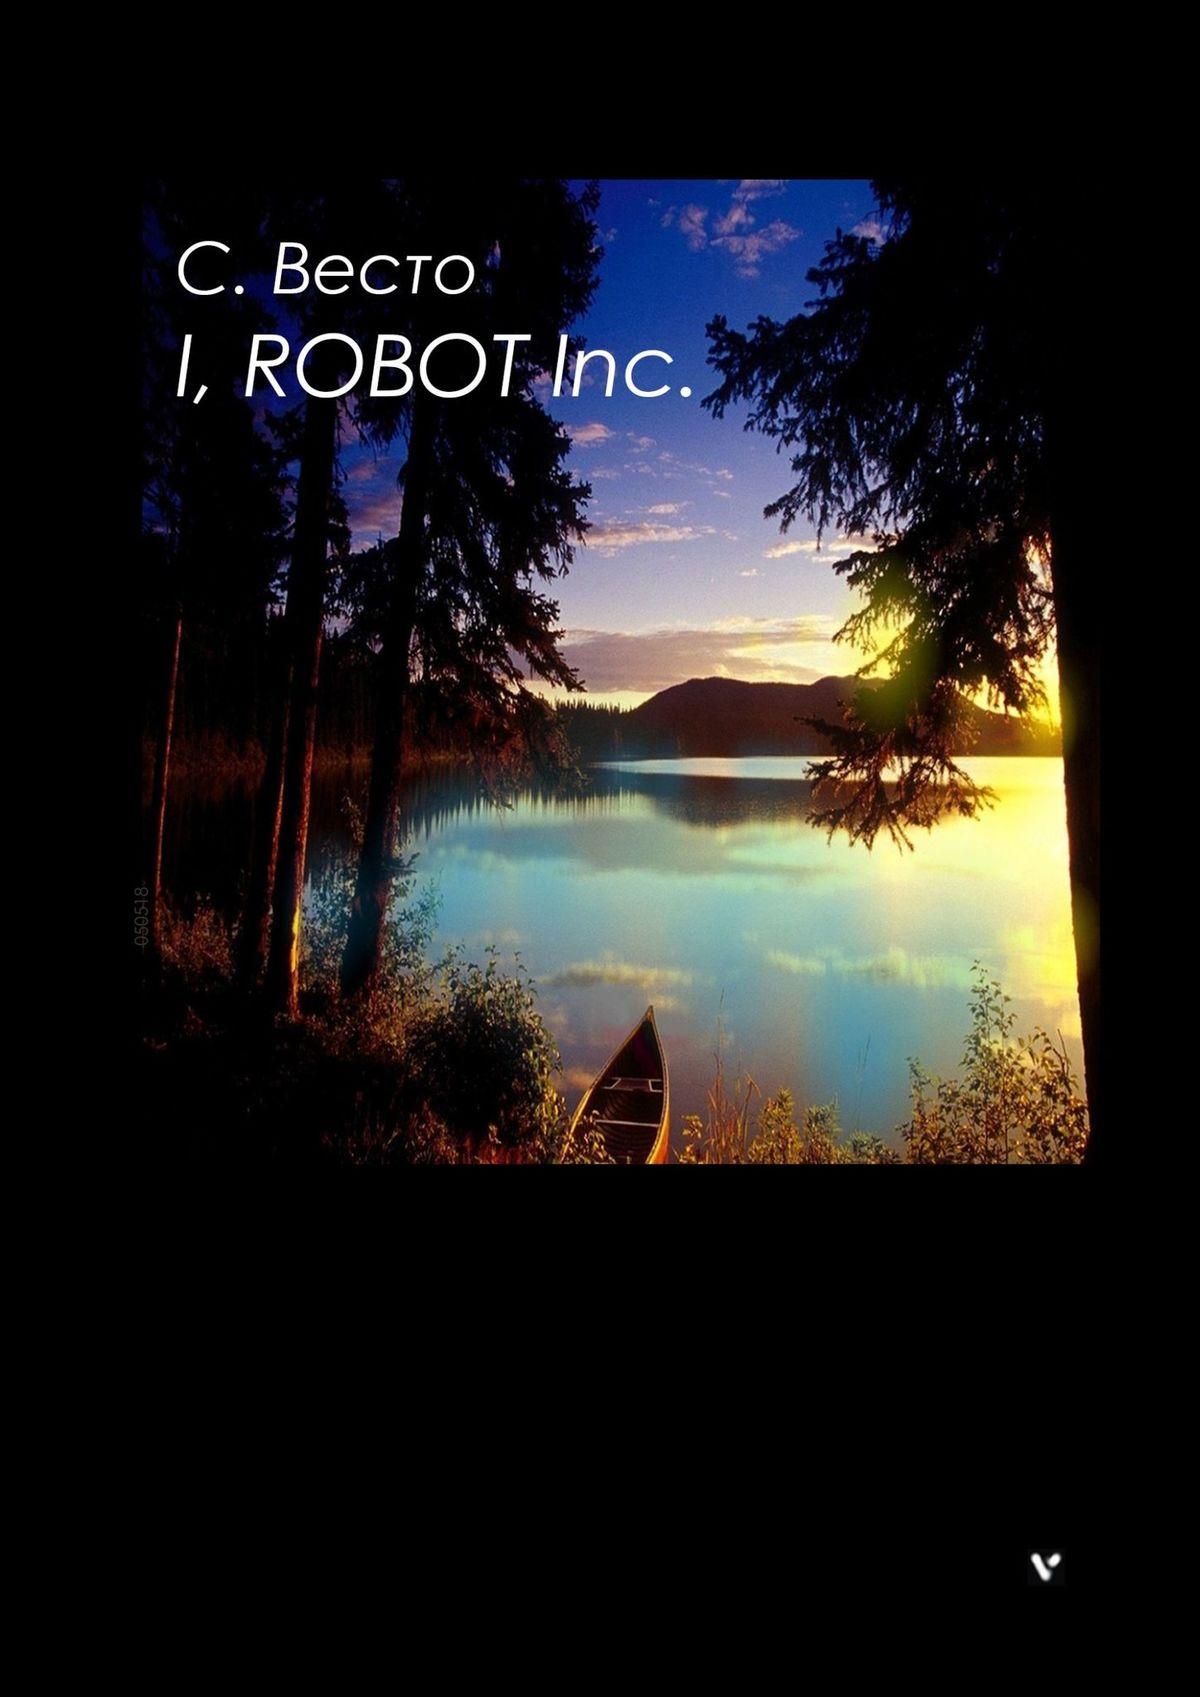 I, ROBOTInc. ( Сен Сейно Весто  )